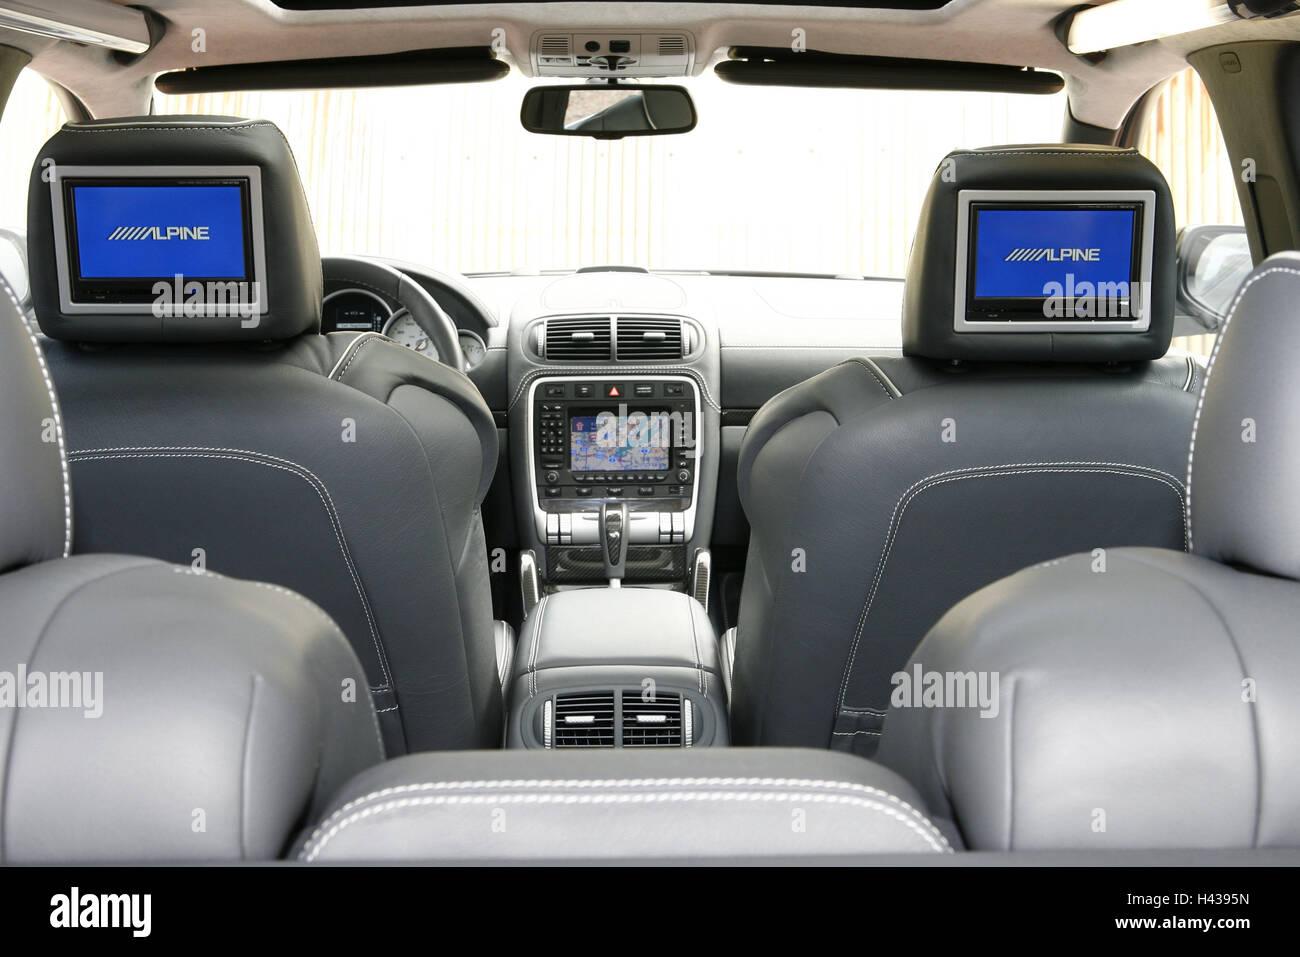 Luxury Cars Porsche Cayenne Ground Interior Vehicle Car Stock Photo Alamy